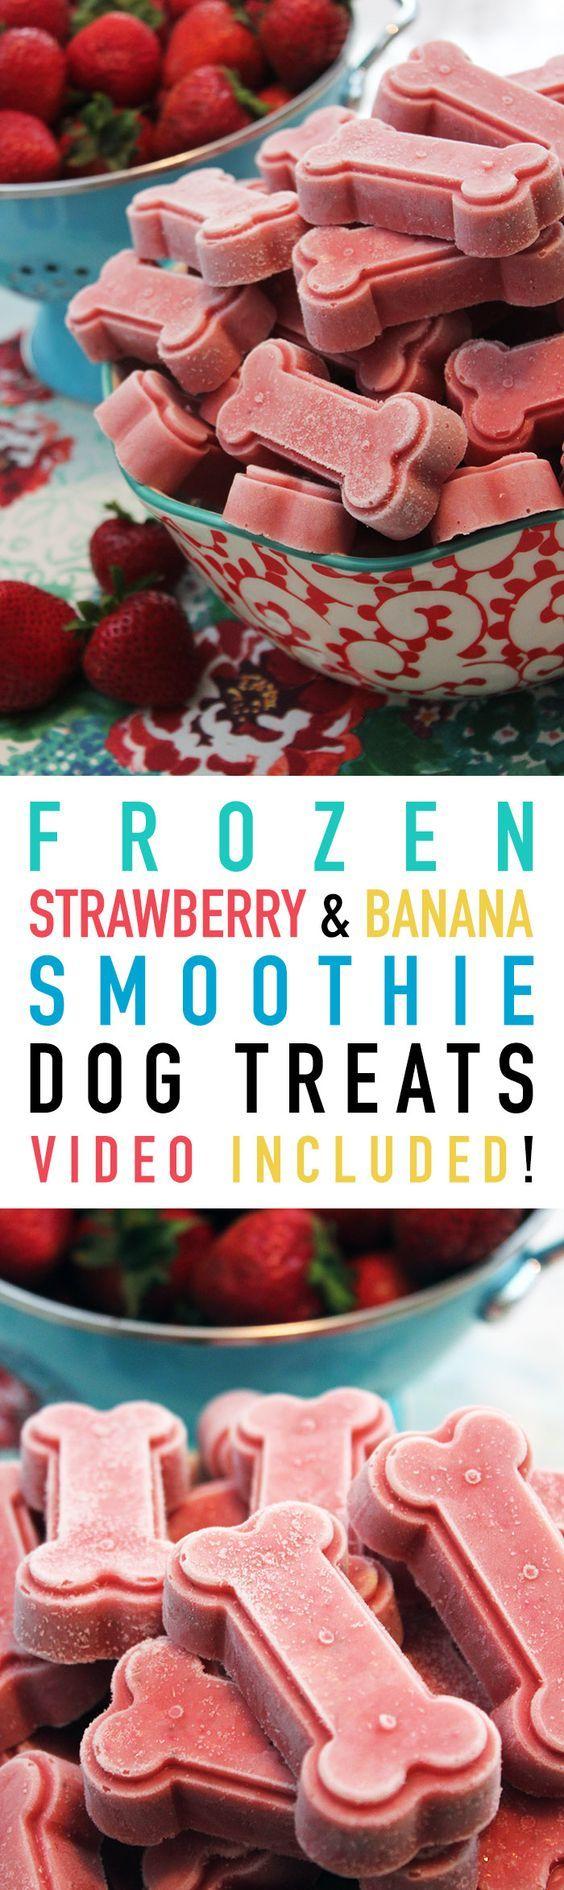 Frozen Strawberry and Banana Smoothie Dog Treats - The Cottage Market